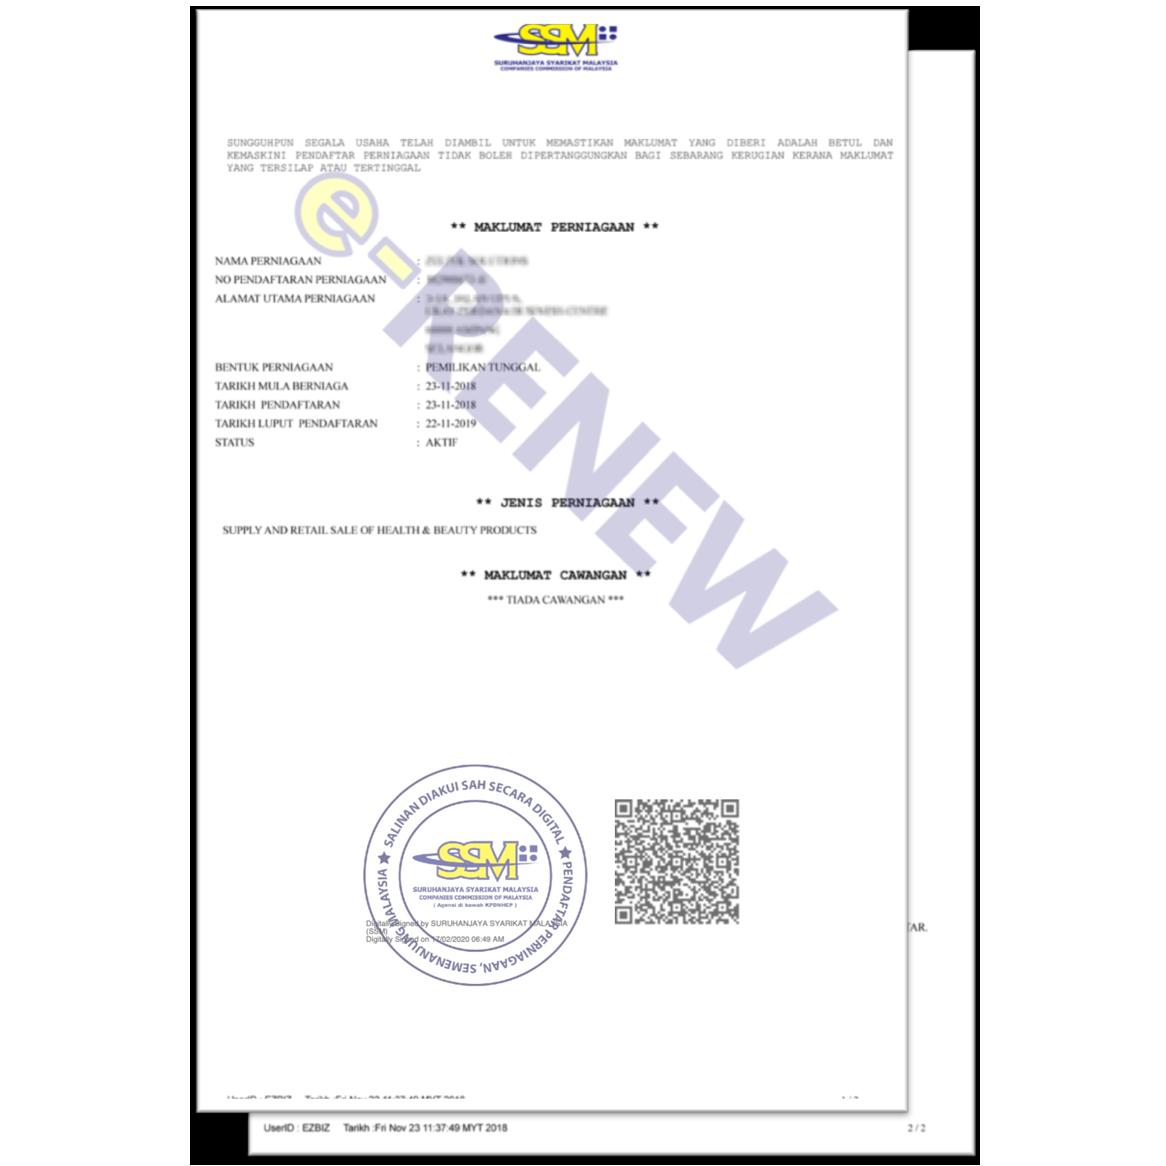 Reprint Ssm Online With Ctc Certified True Copy E Renew My